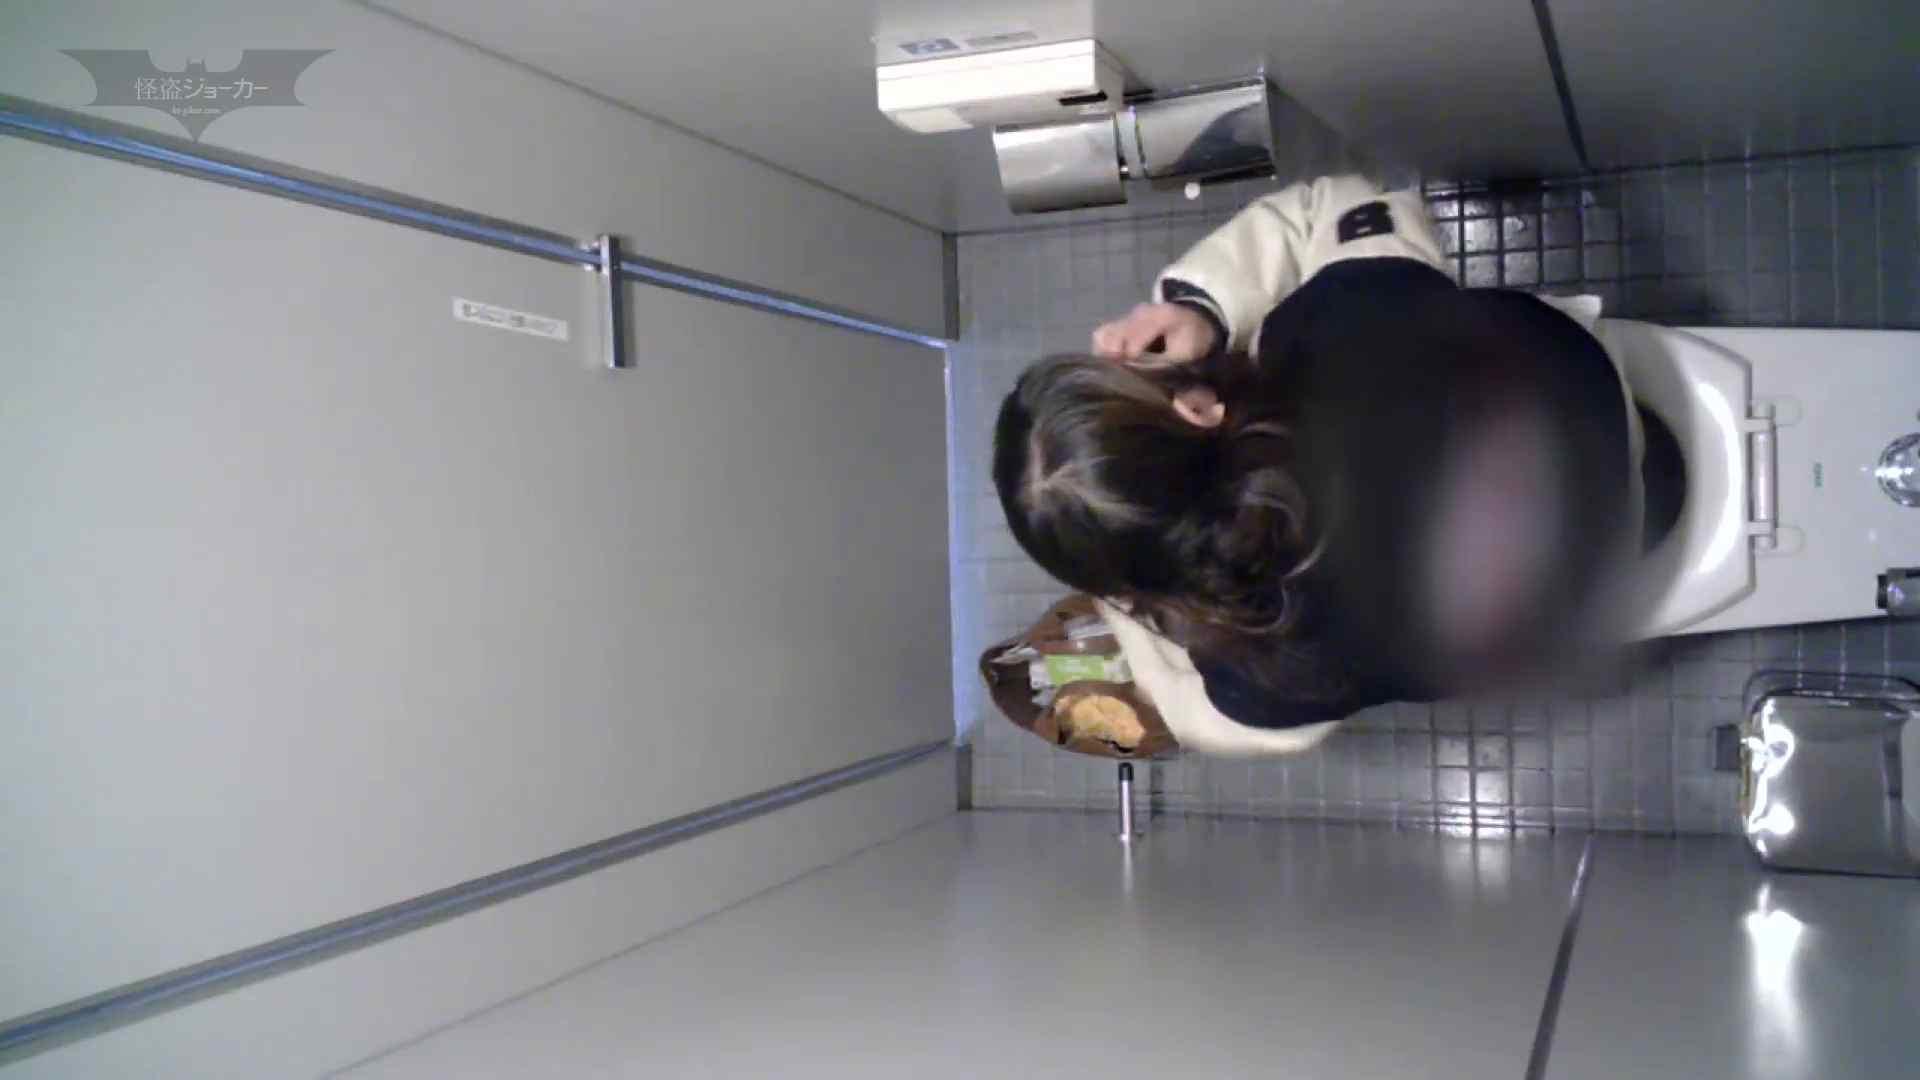 有名大学女性洗面所 vol.58 アンダーヘアーも冬支度? 潜入 性交動画流出 69画像 16